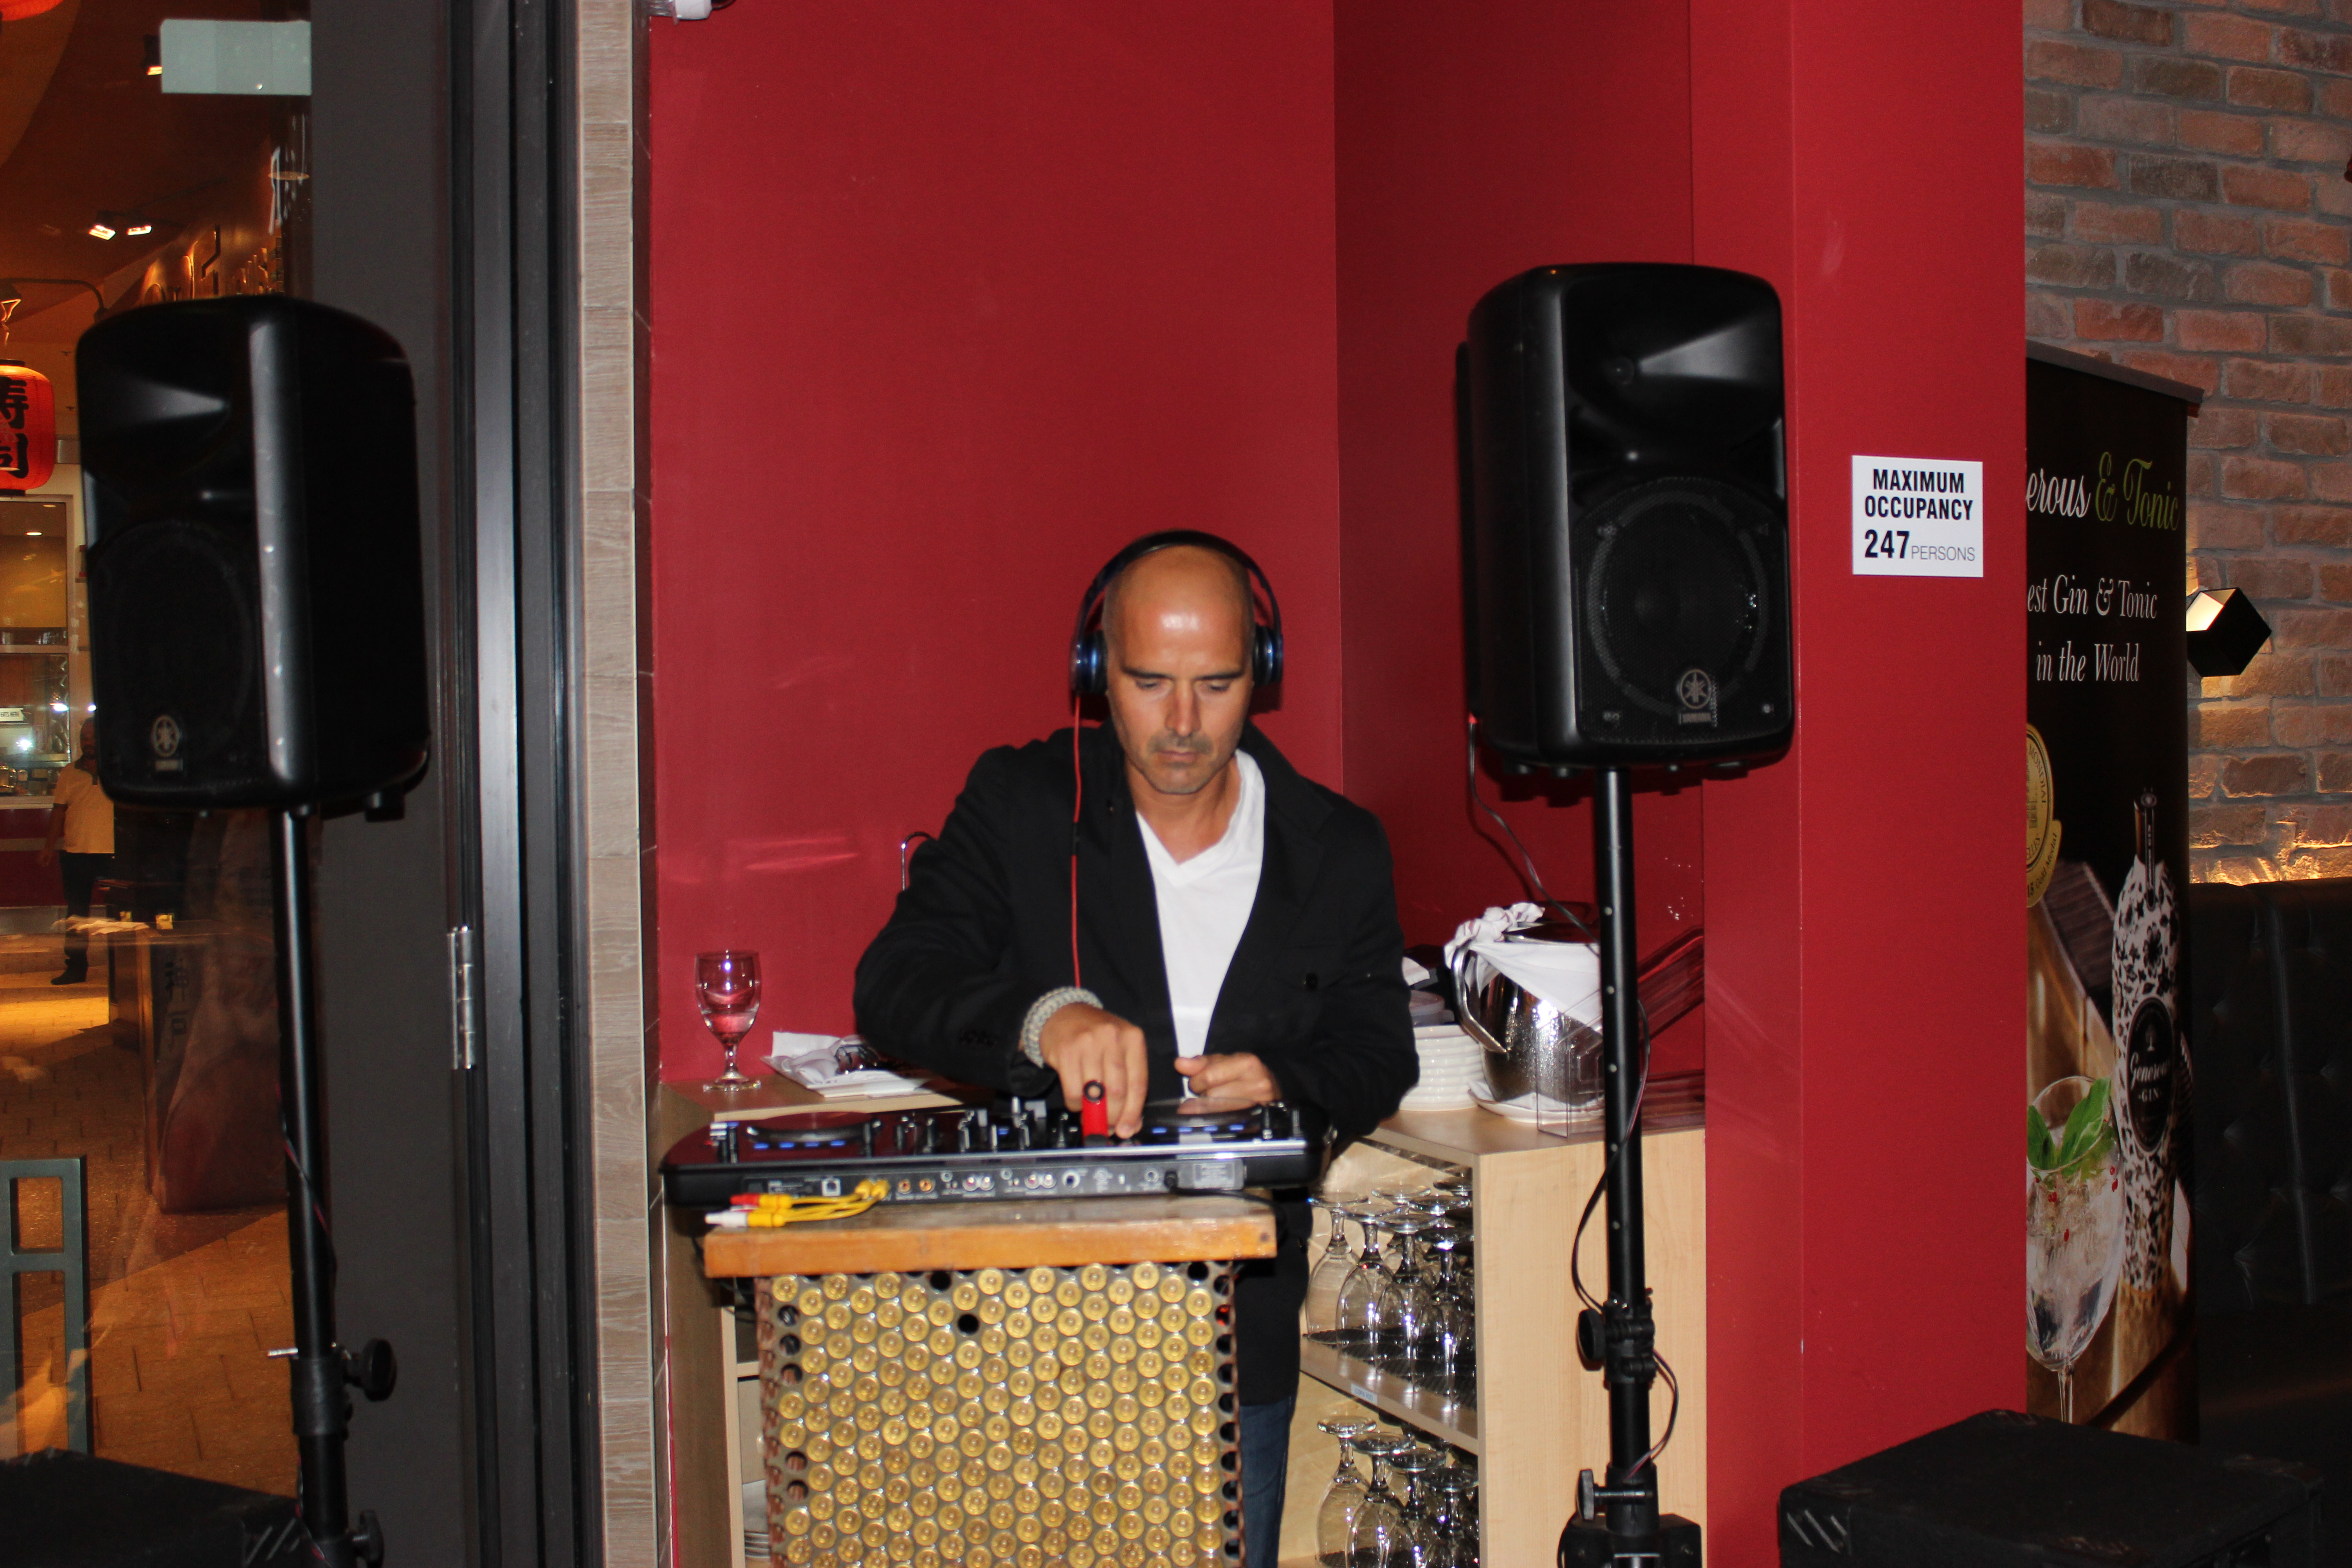 El Gran Inka Grand Opening DJ playing music.